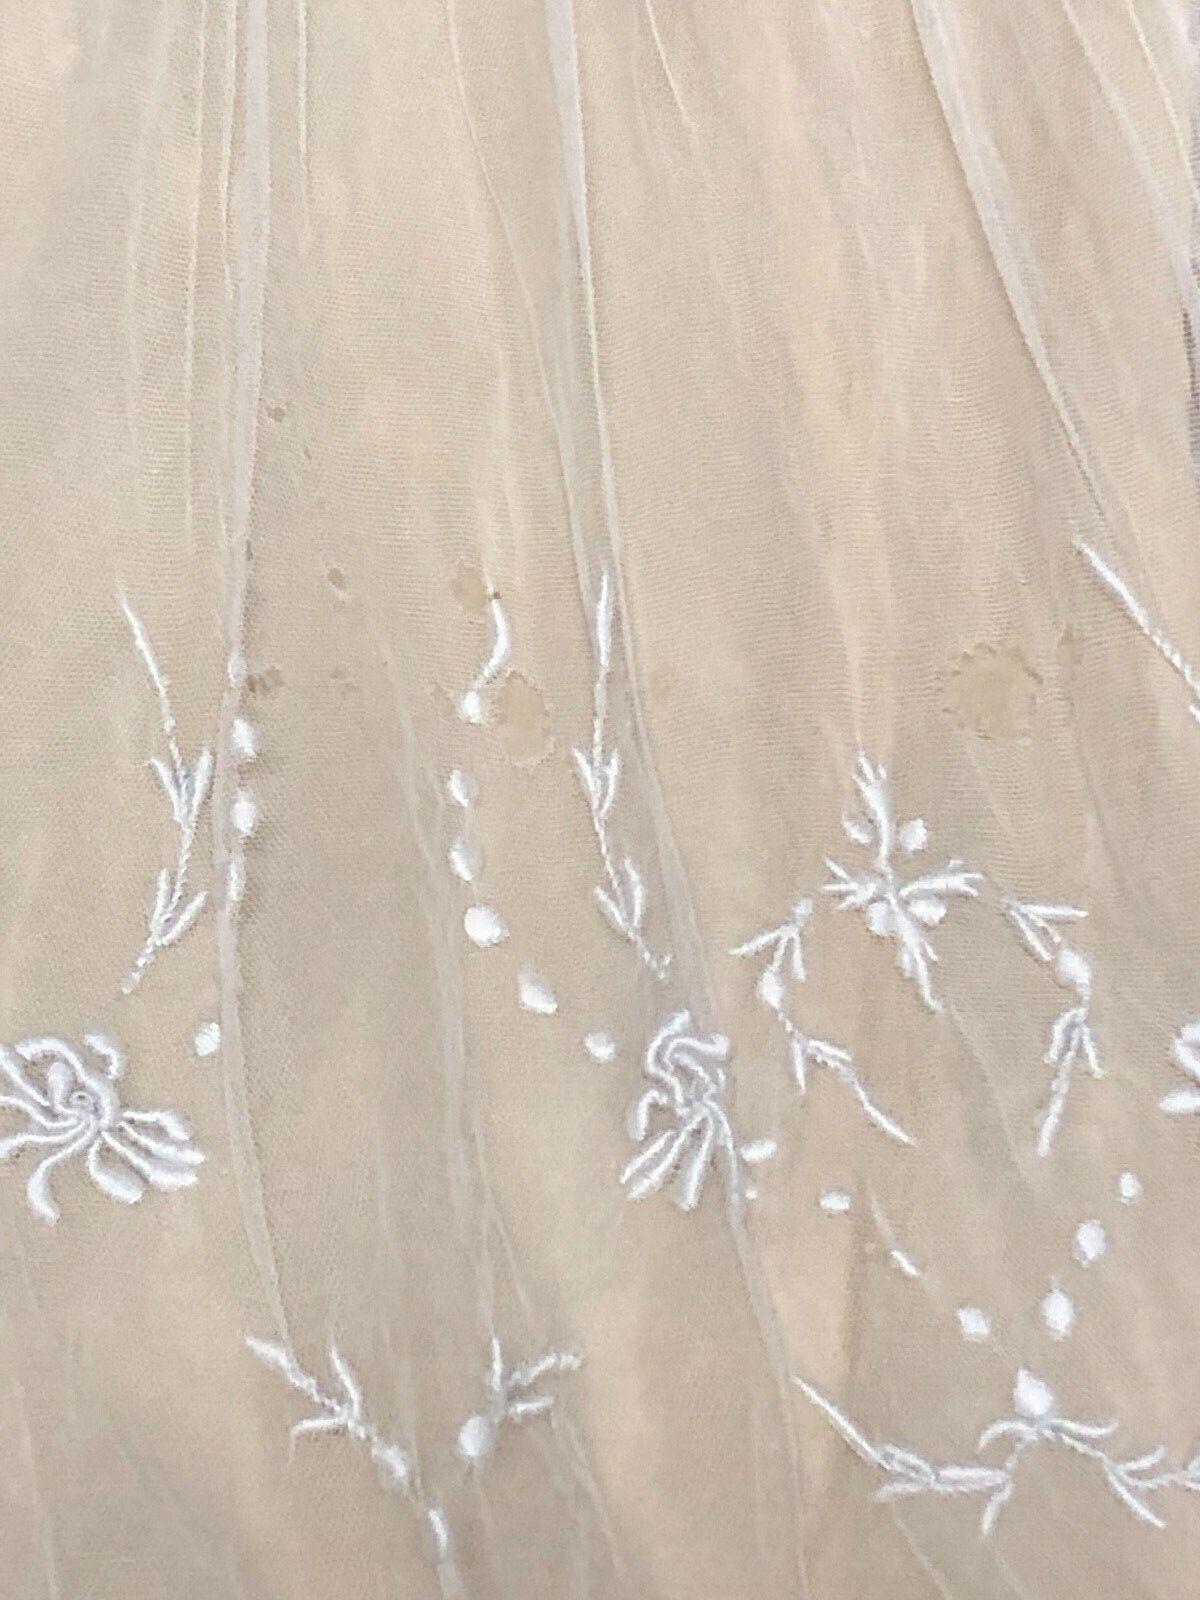 Antique Edwardian White Mesh Dress with Floral Em… - image 9